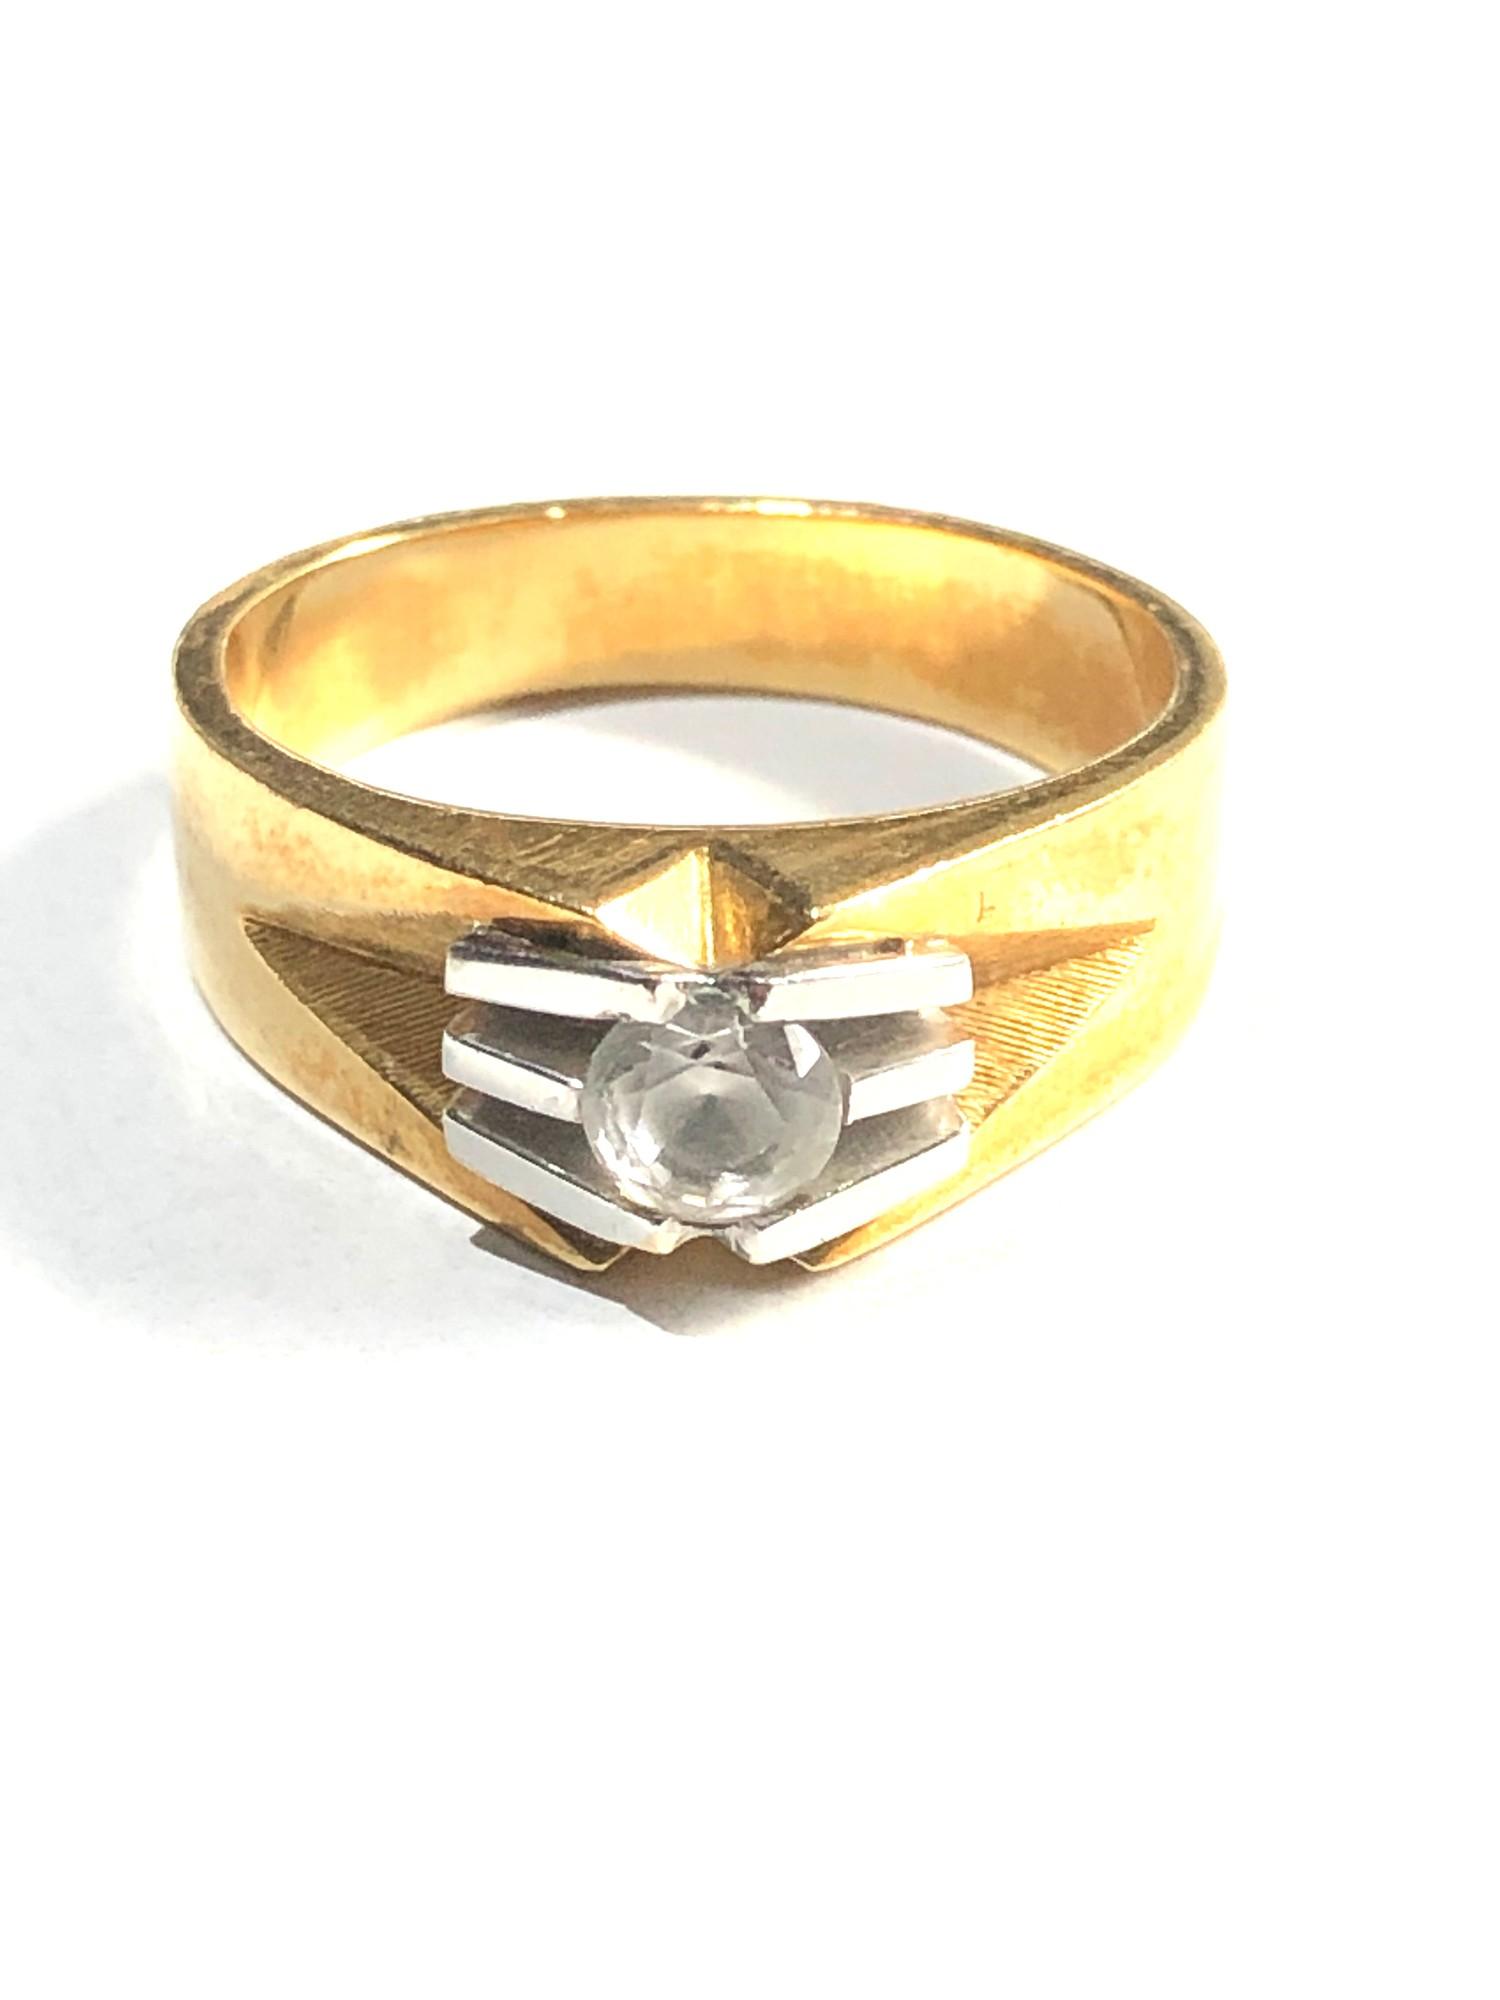 18ct stone set modernist design ring 6.8g - Image 2 of 3